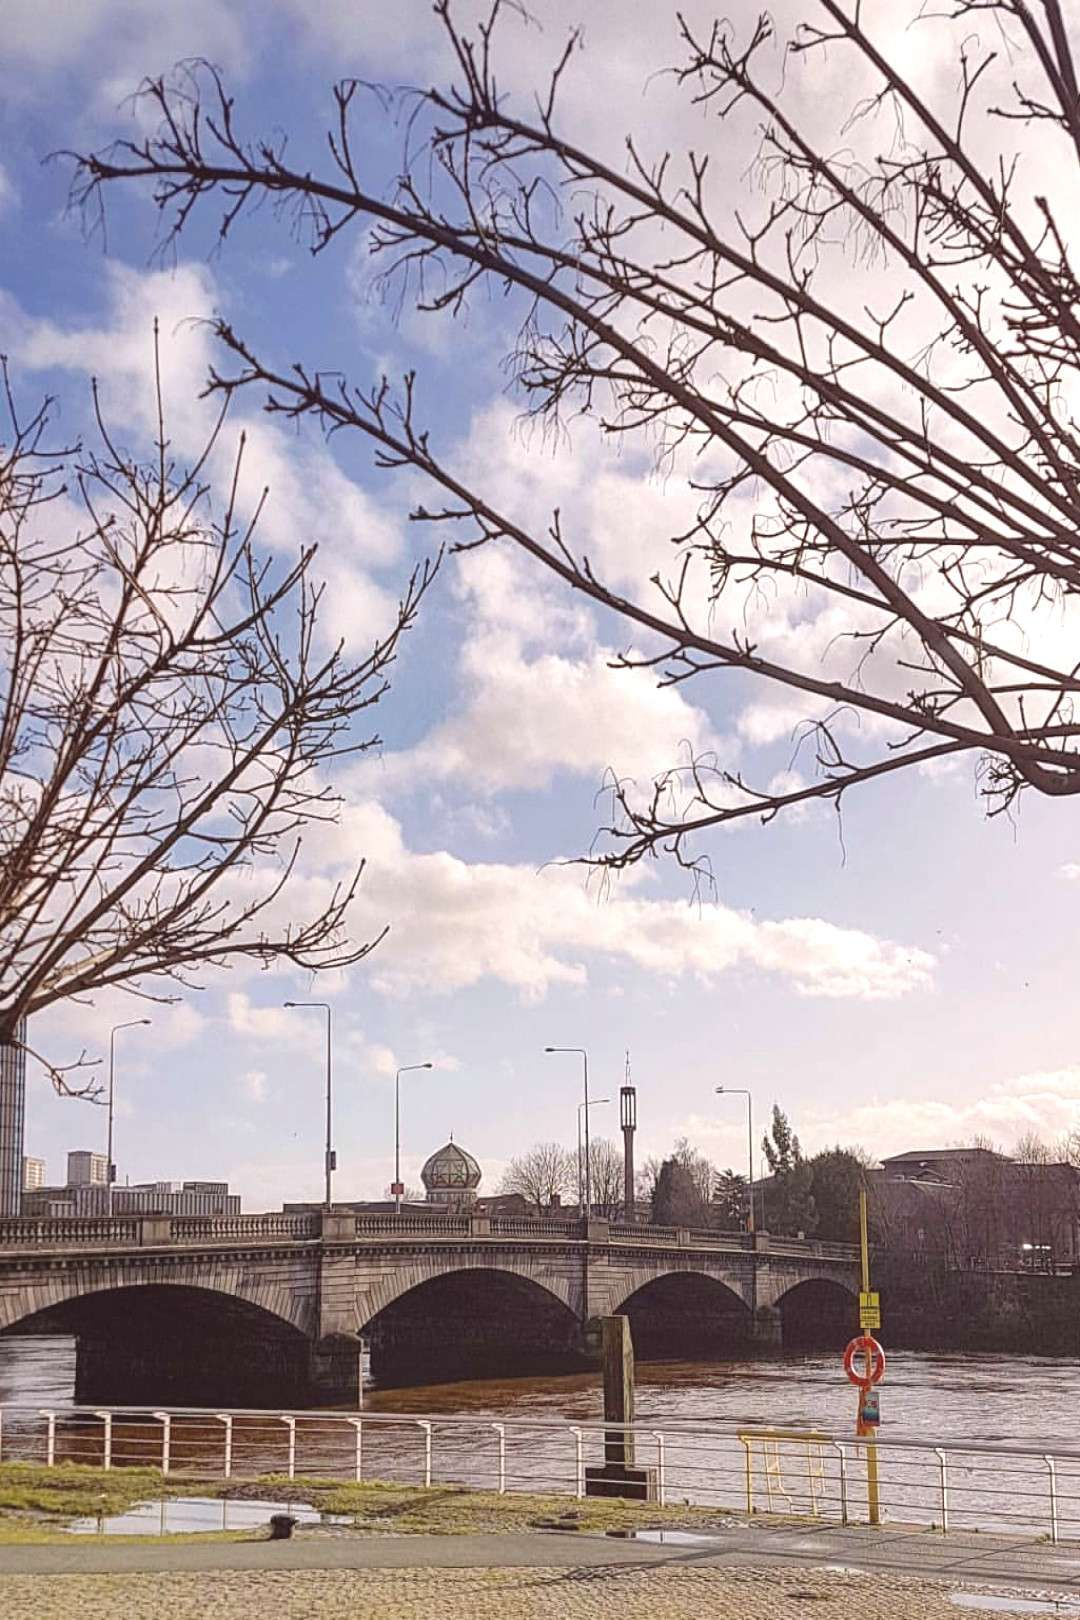 #glasgowcentralmosque #glasgowcity #roadtrip #citylife #glasgow #water #and #glasgow #glasgowcity #roadtrip #citylife #glasgowcentralmosque #You can find Colin farrell and more on our website.#glasgow #glasgowcity #roadtrip #citylife #g...